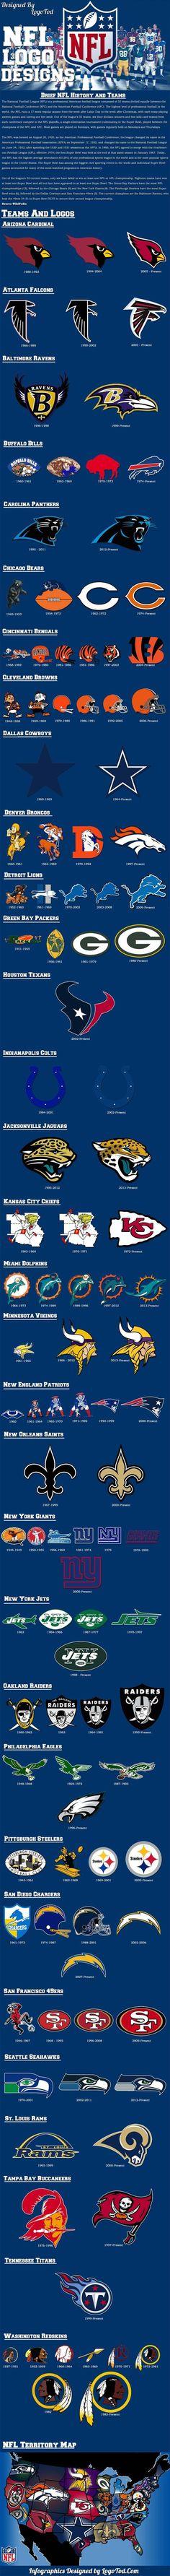 NFL Football Team Logo Evolutions